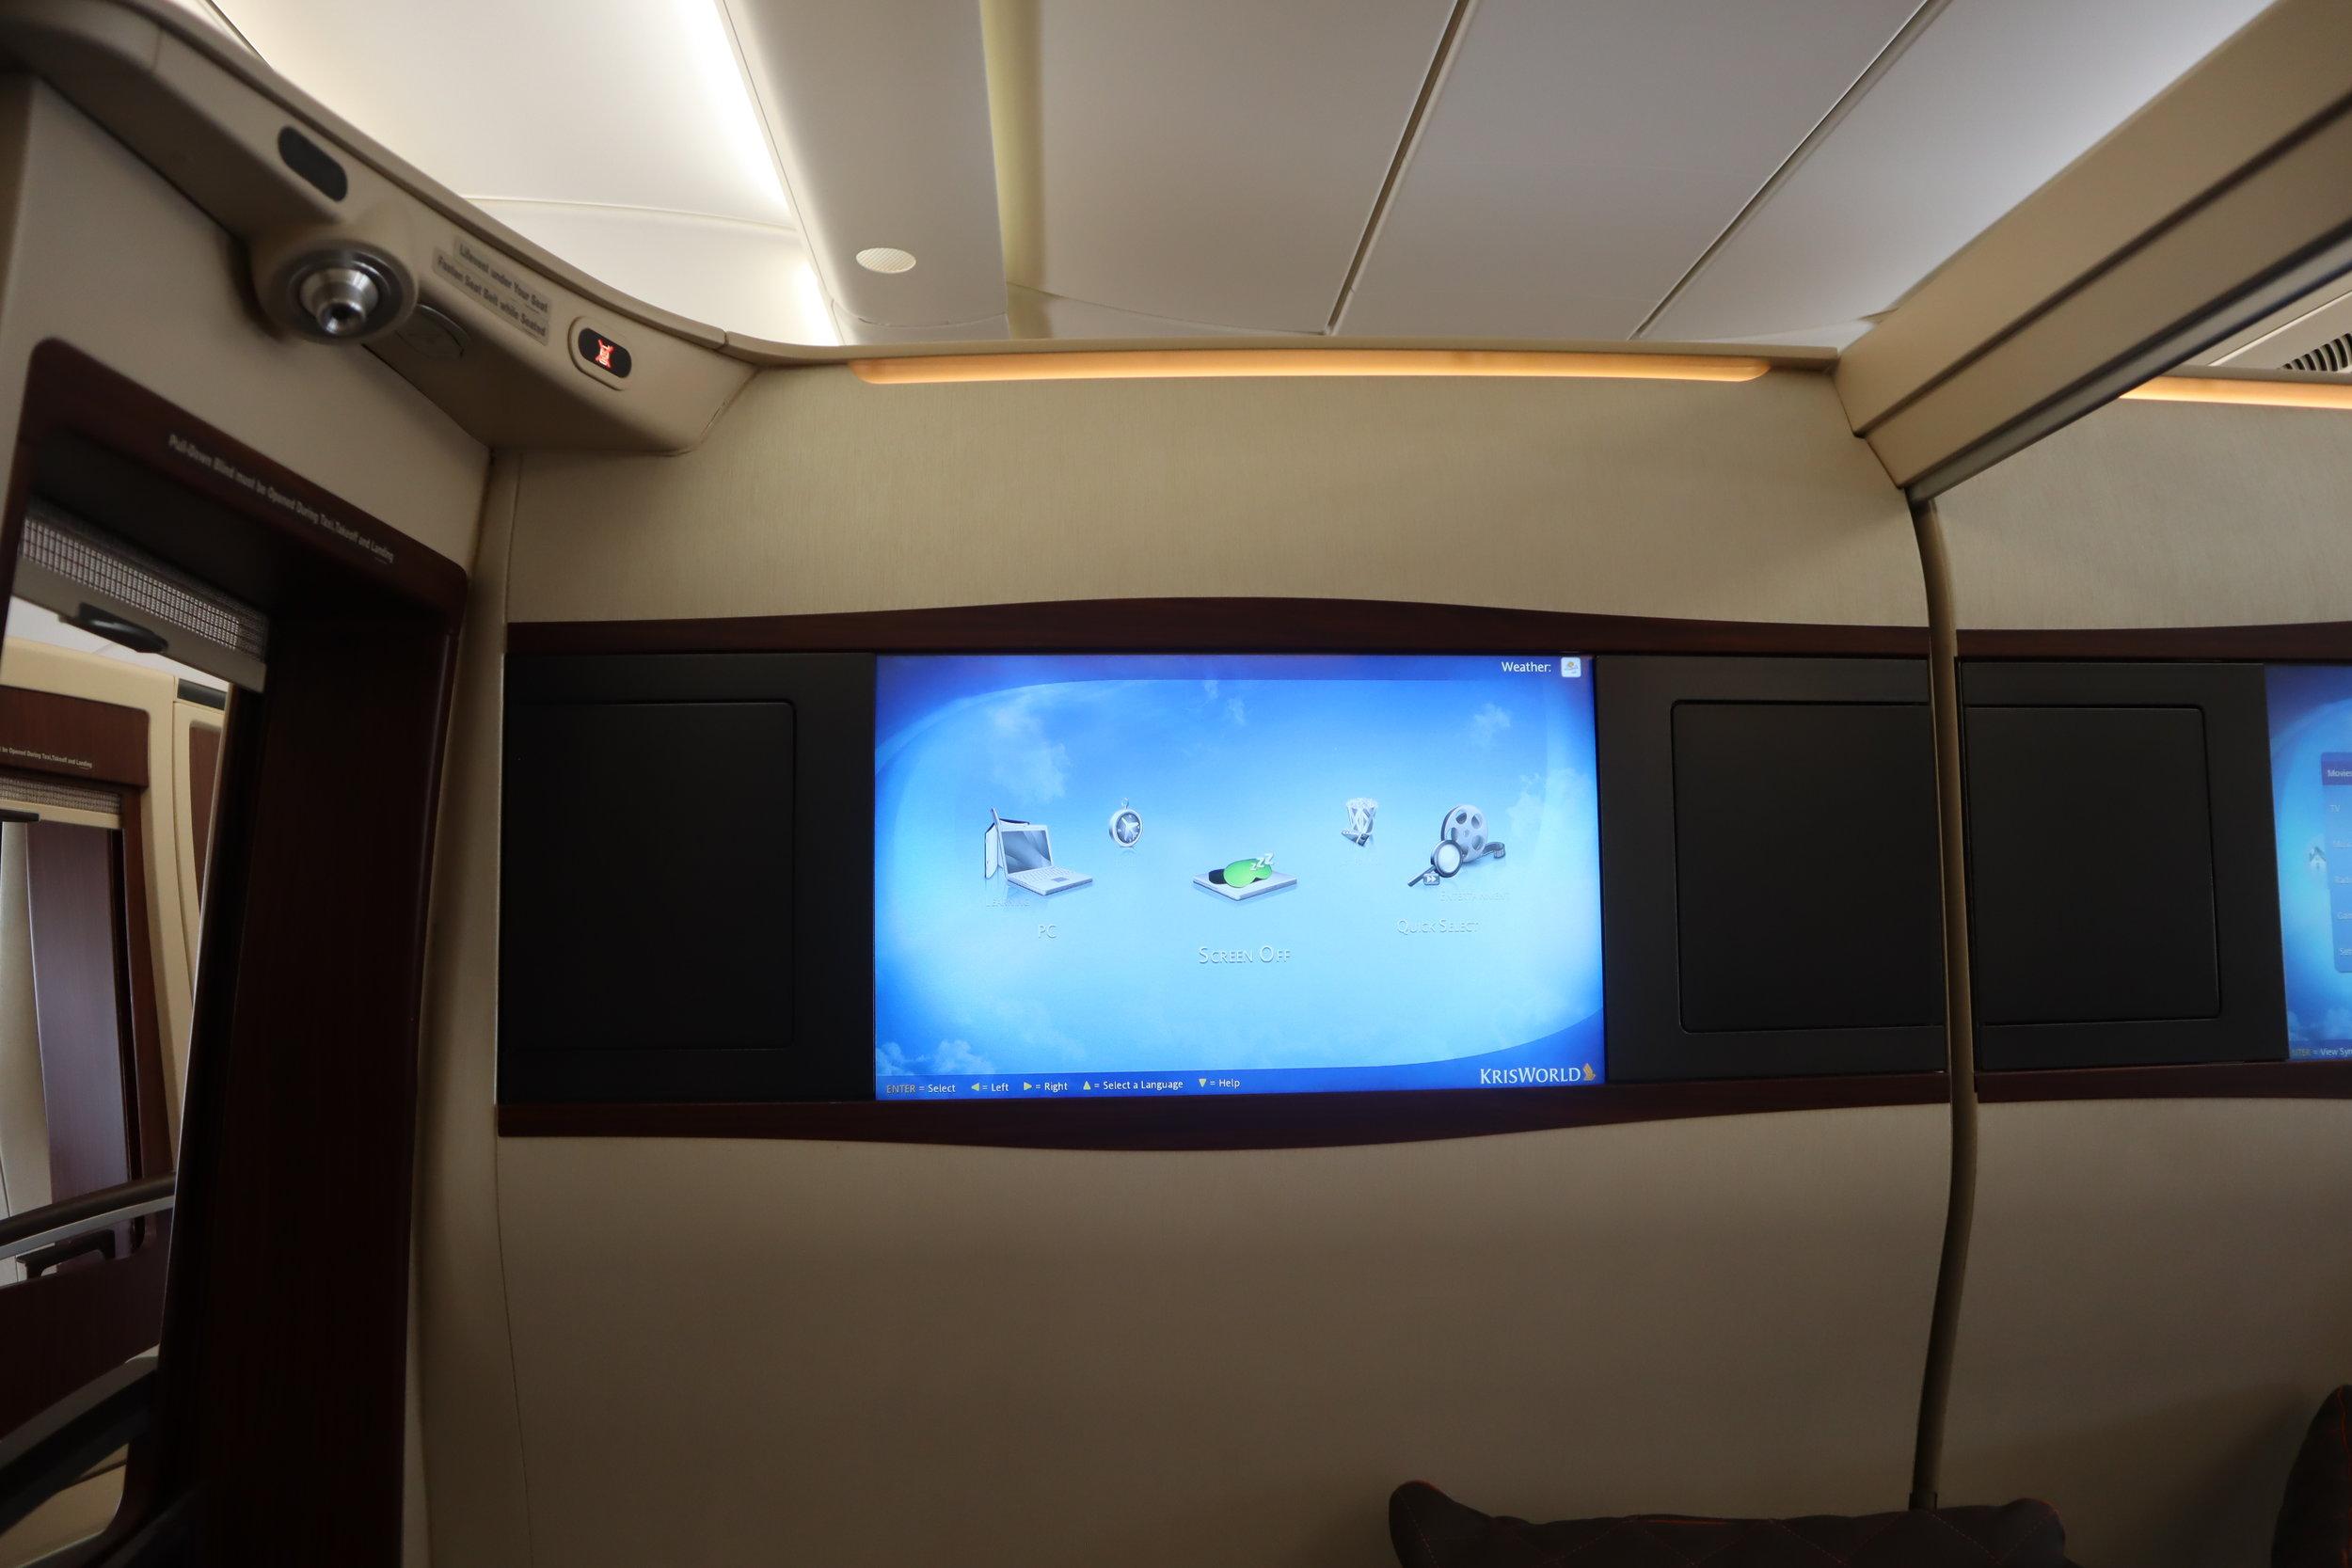 Singapore Airlines Suites Class – Entertainment screen